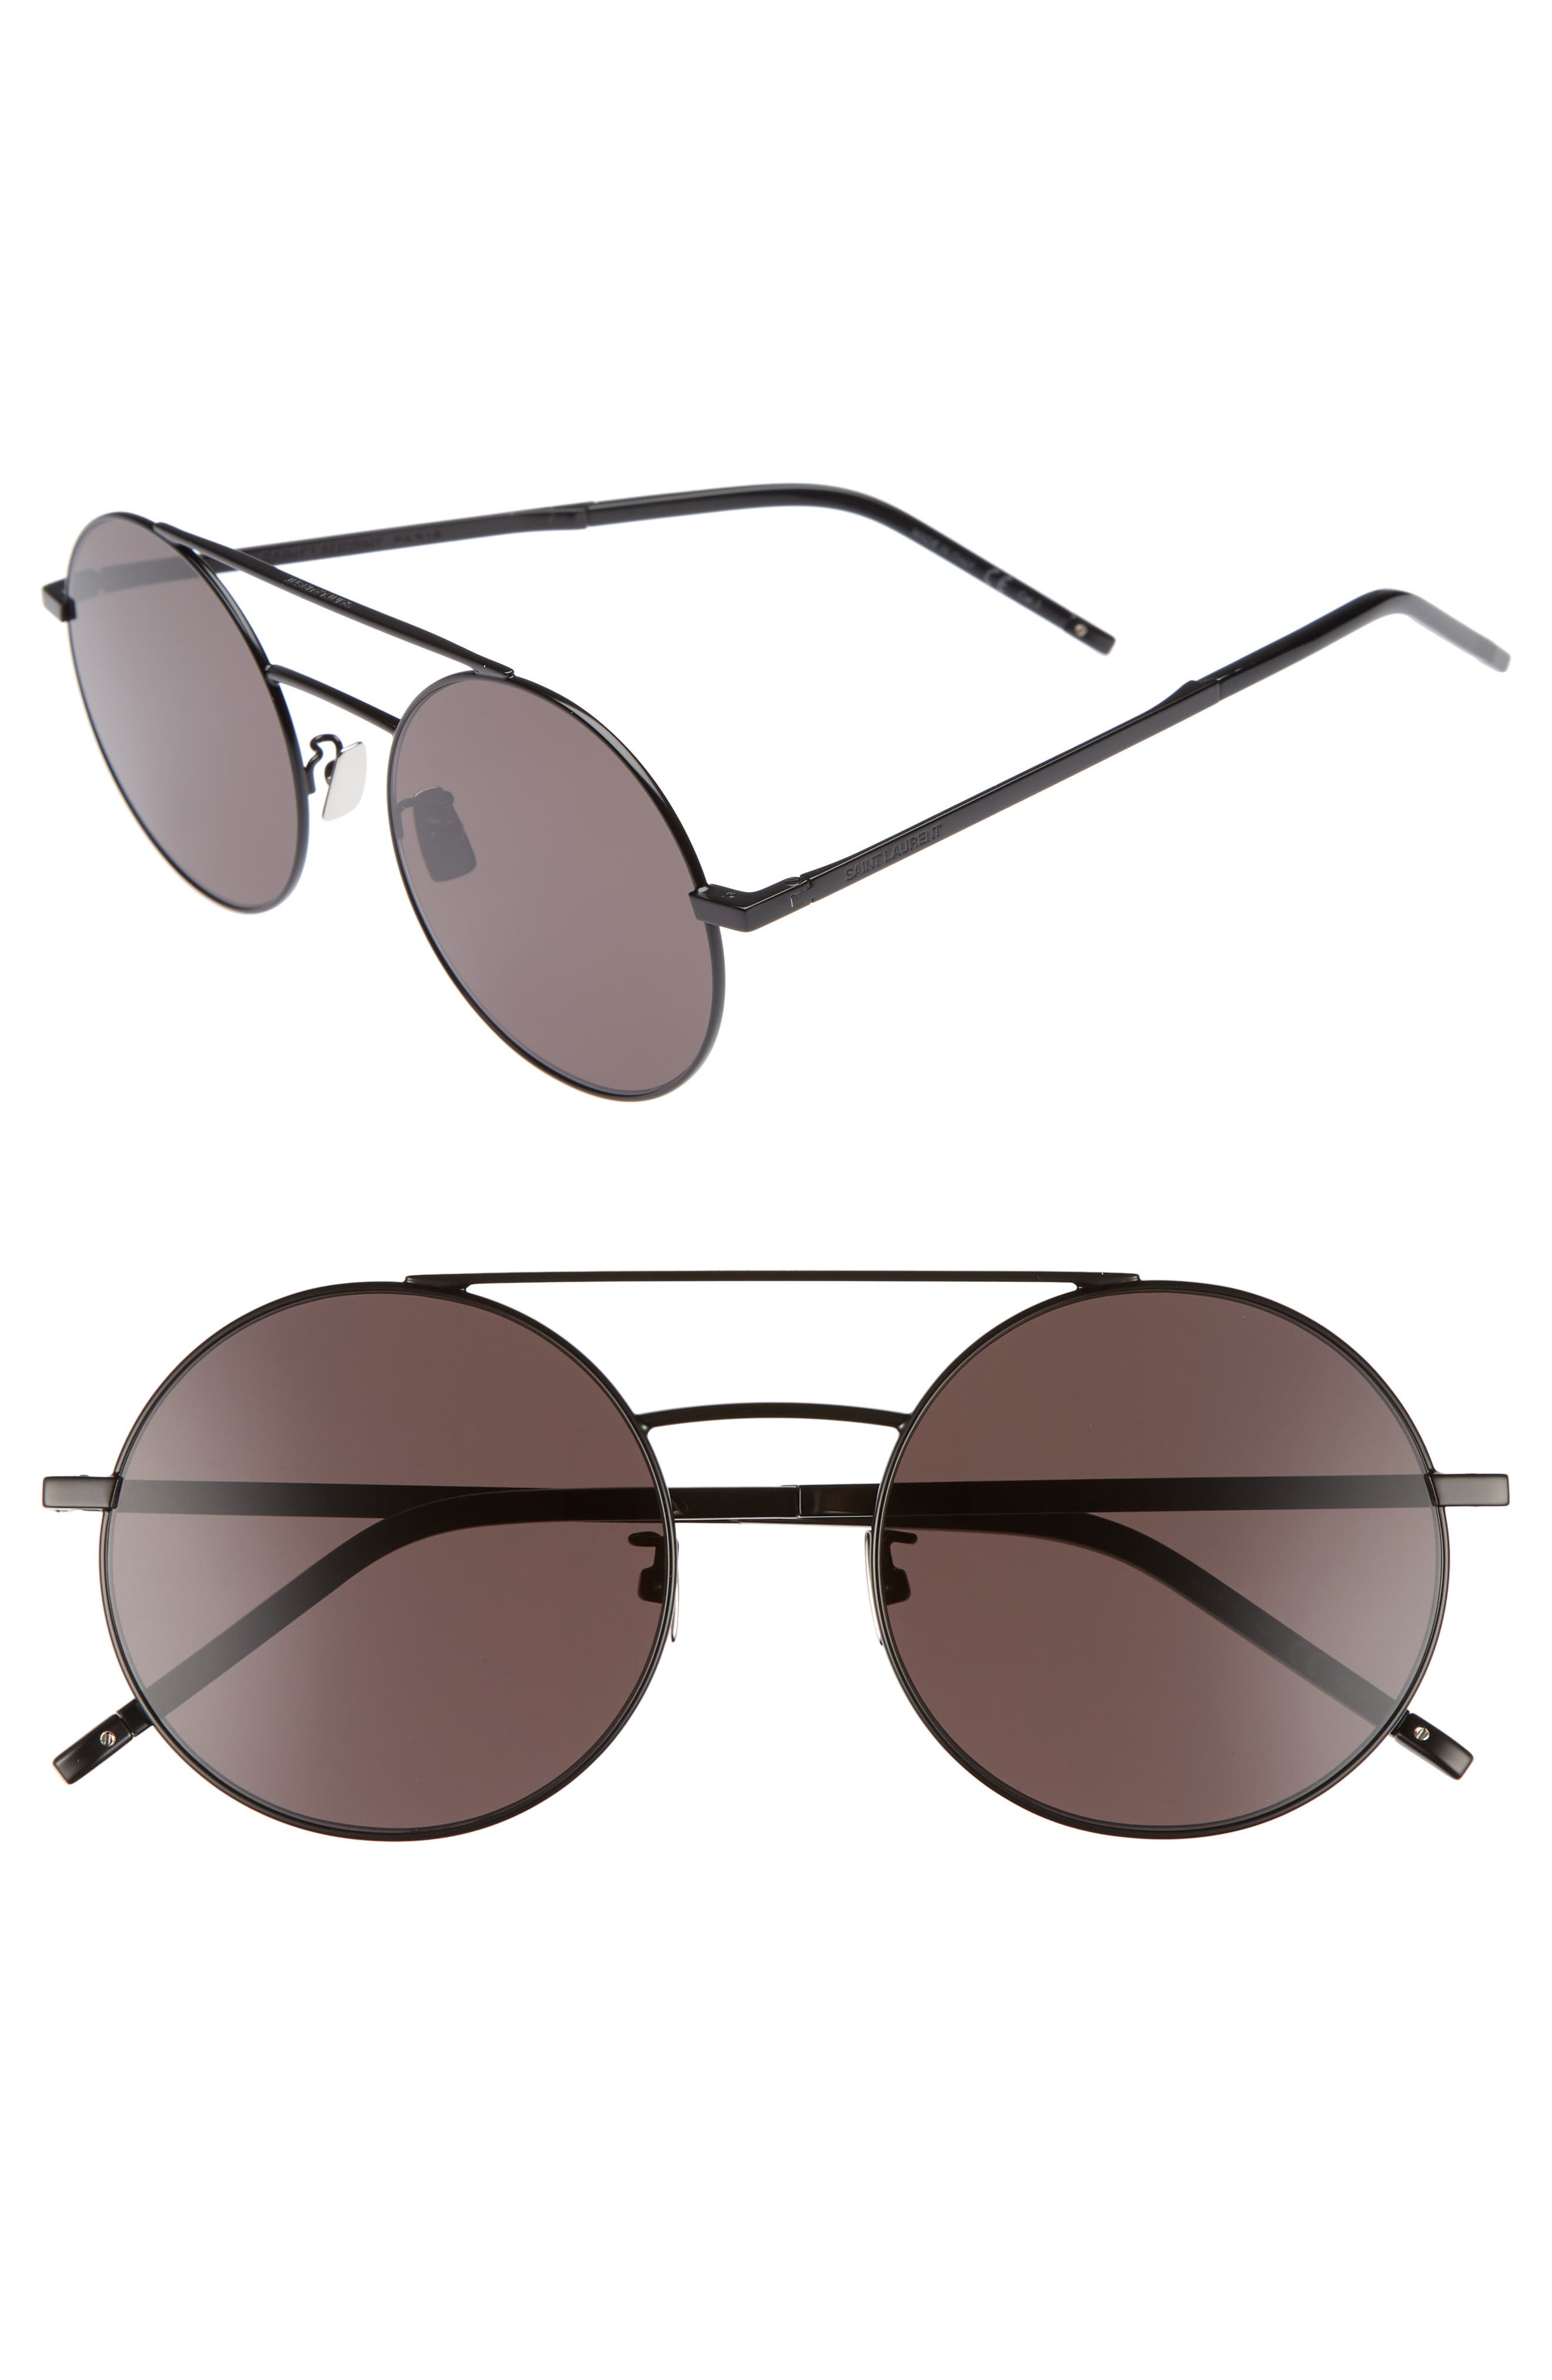 SL 210/F 56mm Round Aviator Sunglasses,                             Main thumbnail 1, color,                             BLACK